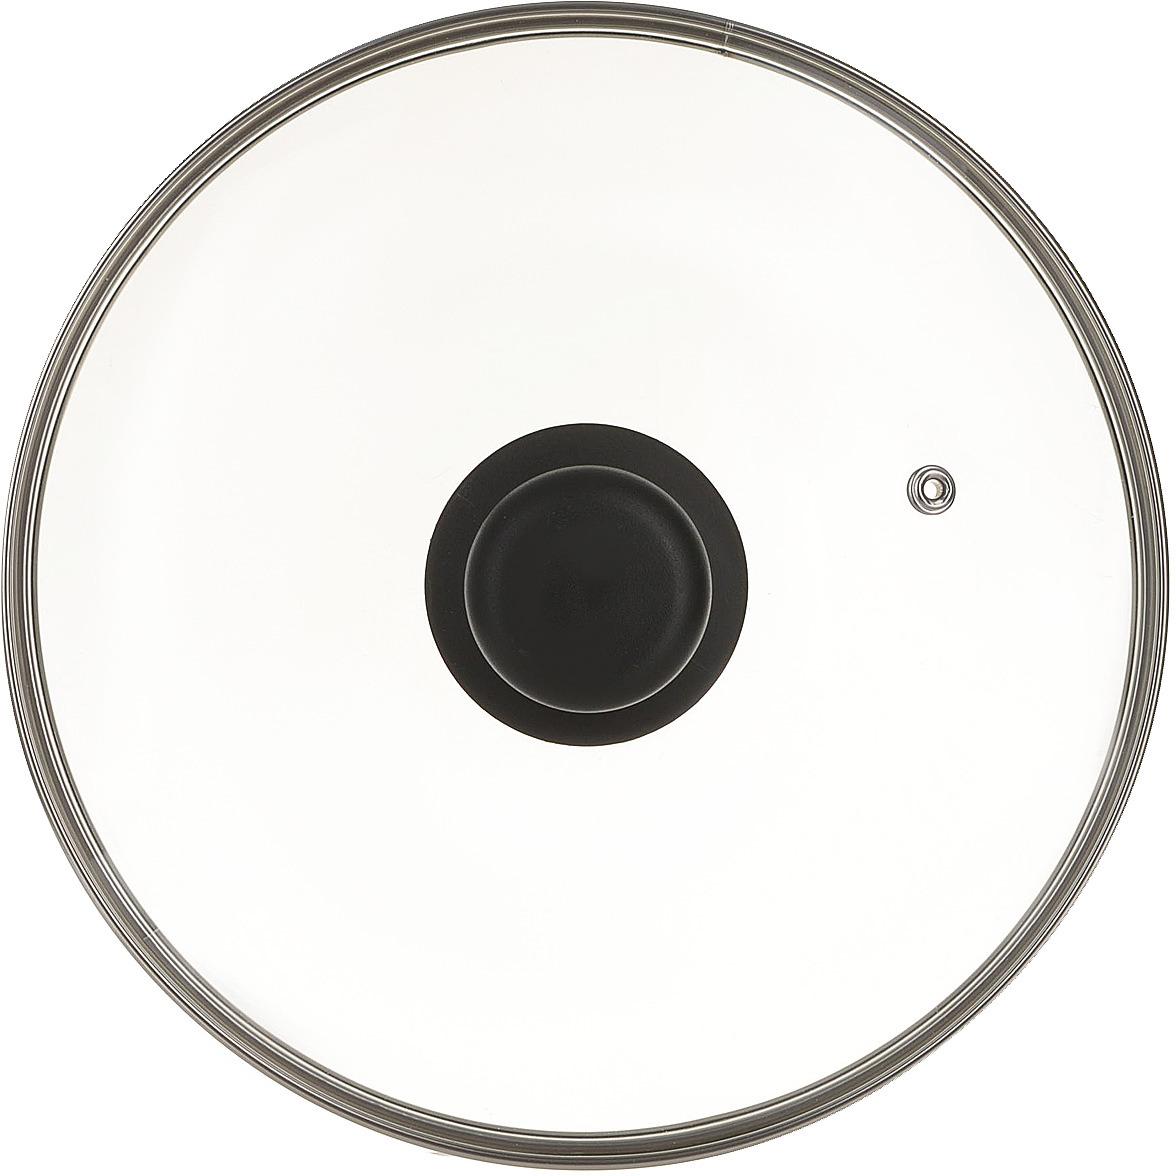 Крышка TVS, 4722, прозрачный, диаметр 22 см цена